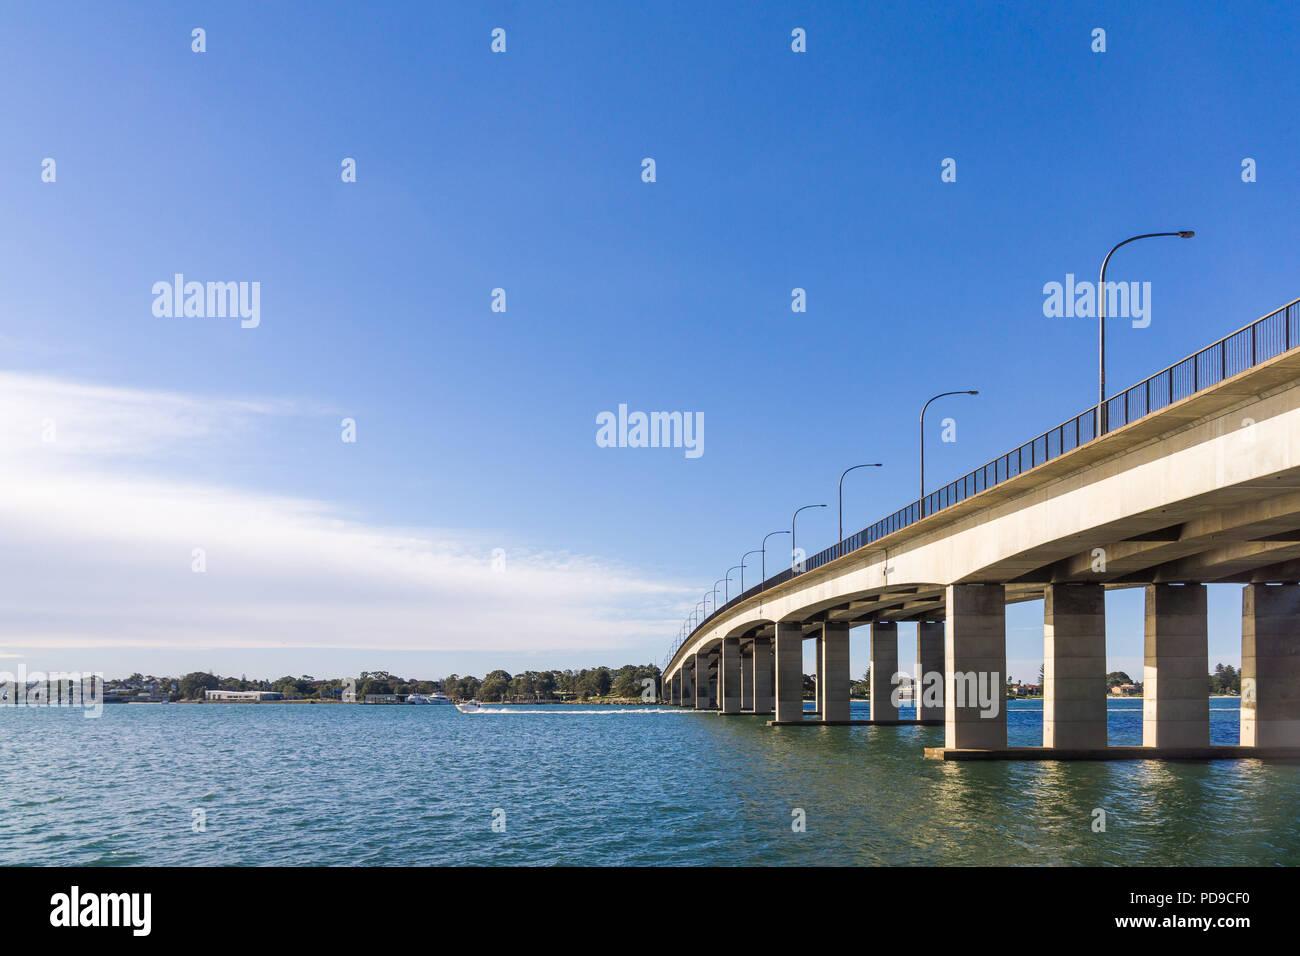 The Captain Cook Bridge in Sydney Stock Photo